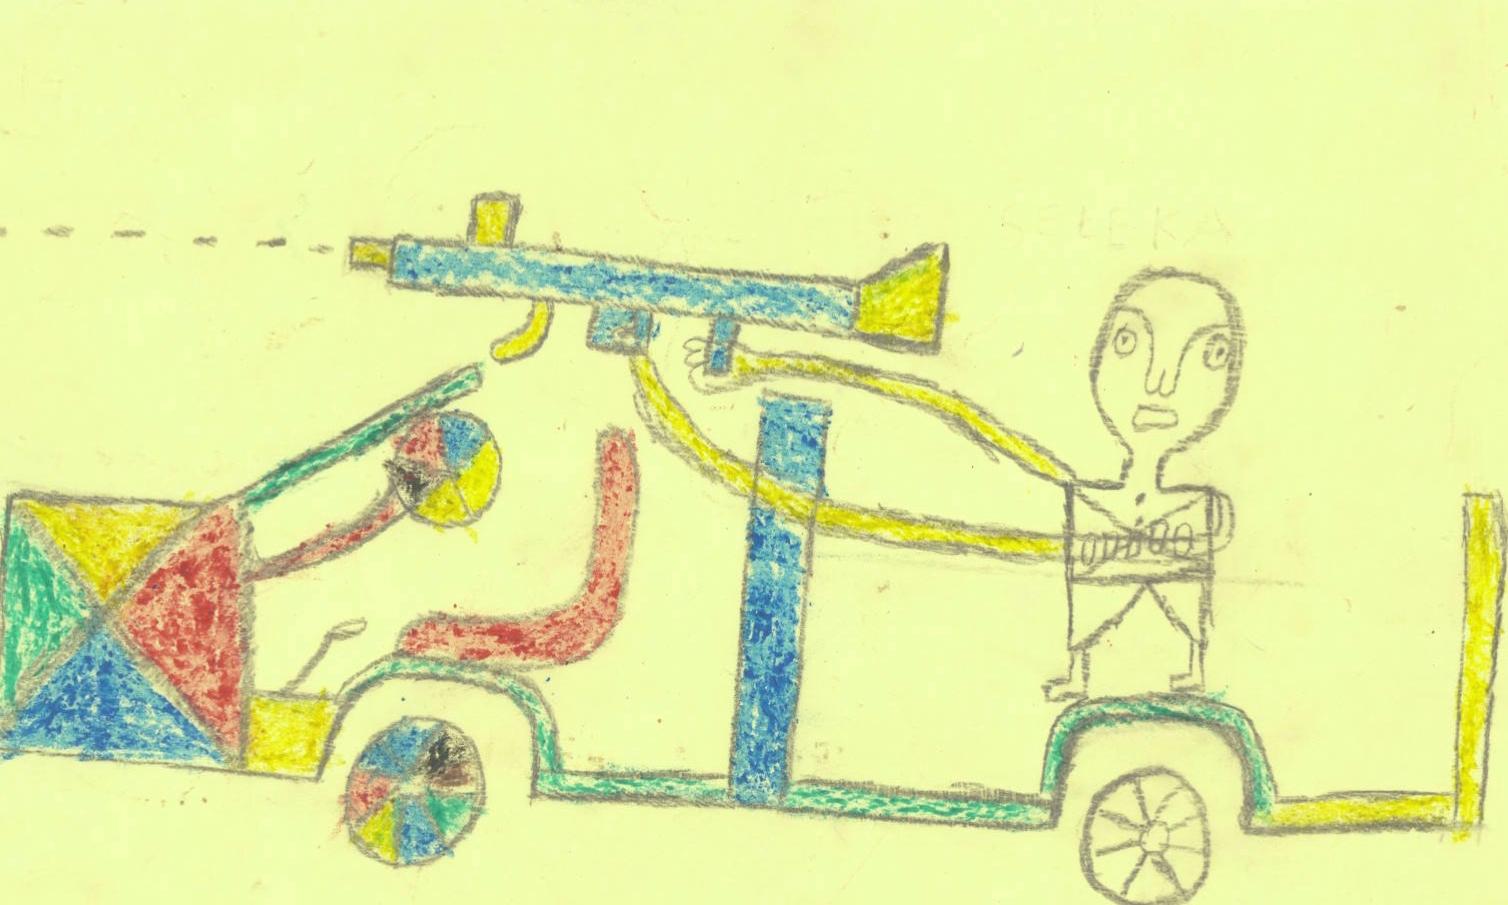 1508x905 Helping Children In Car Cope With Trauma